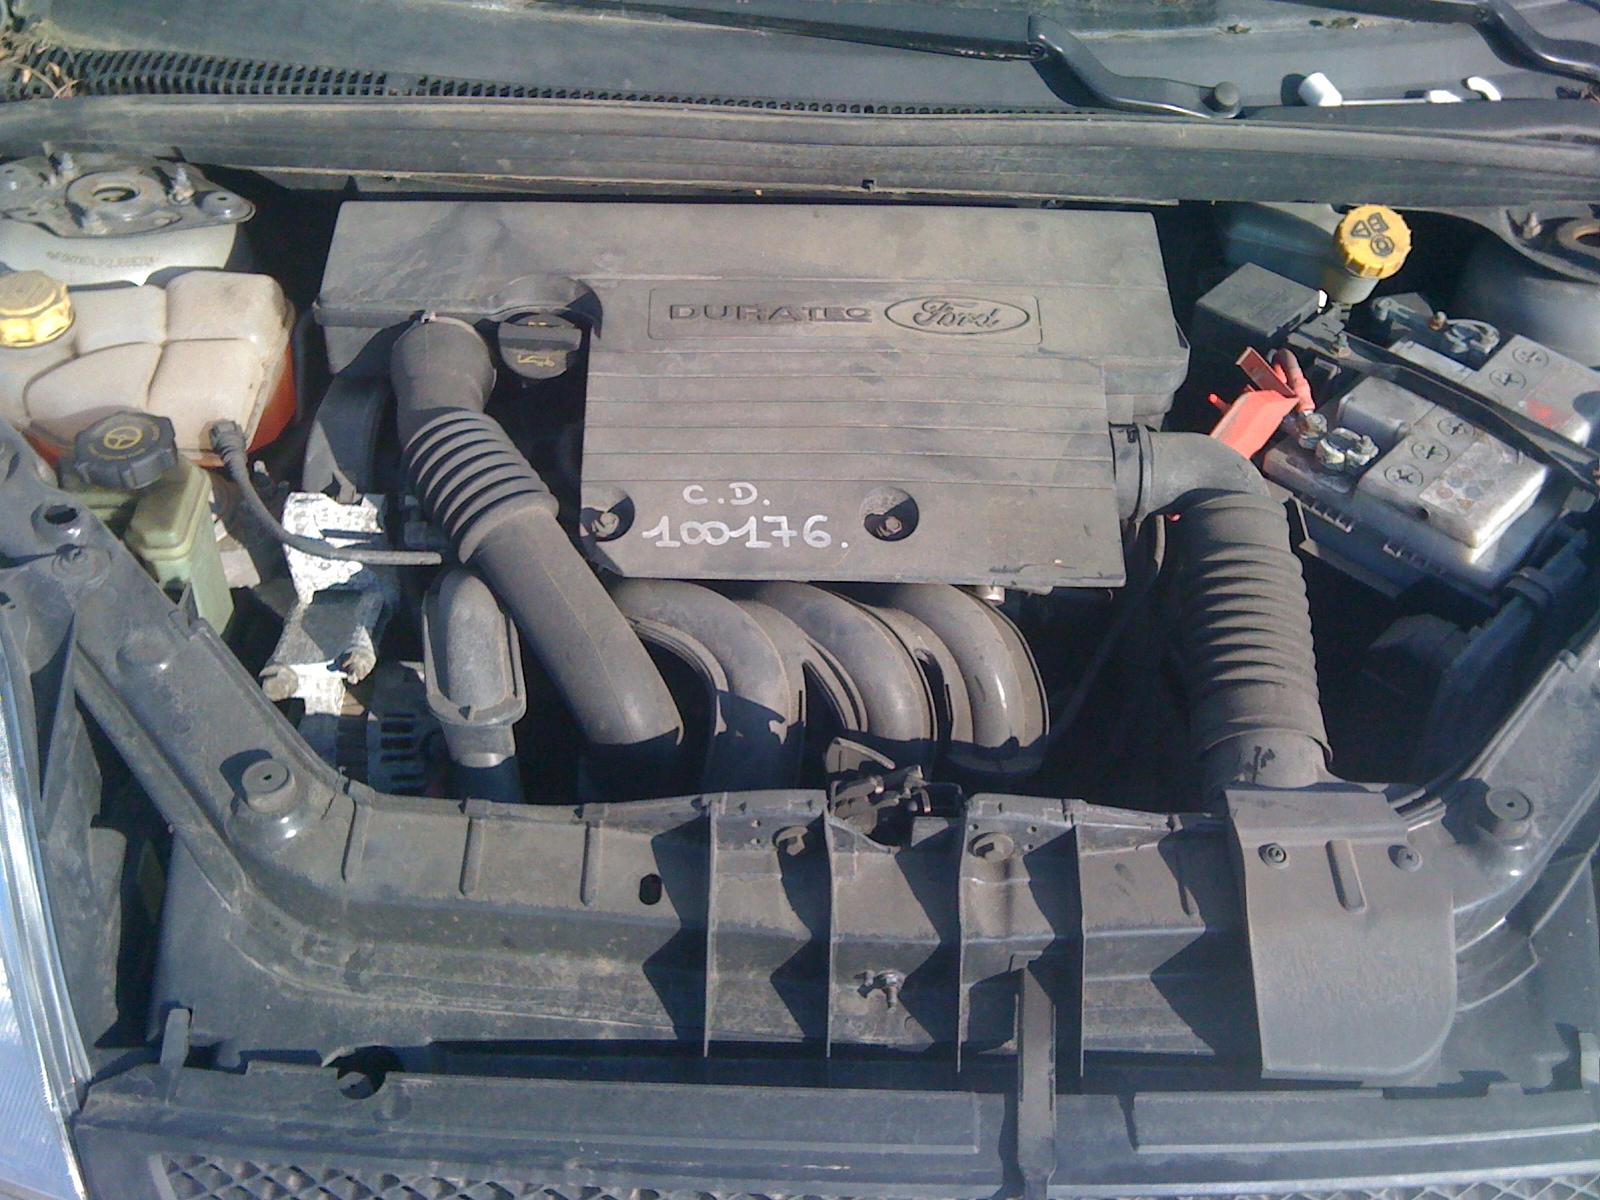 Ford Fiesta avariat 2003 Benzina Hatchback - 14 Februarie 2011 - Poza 1